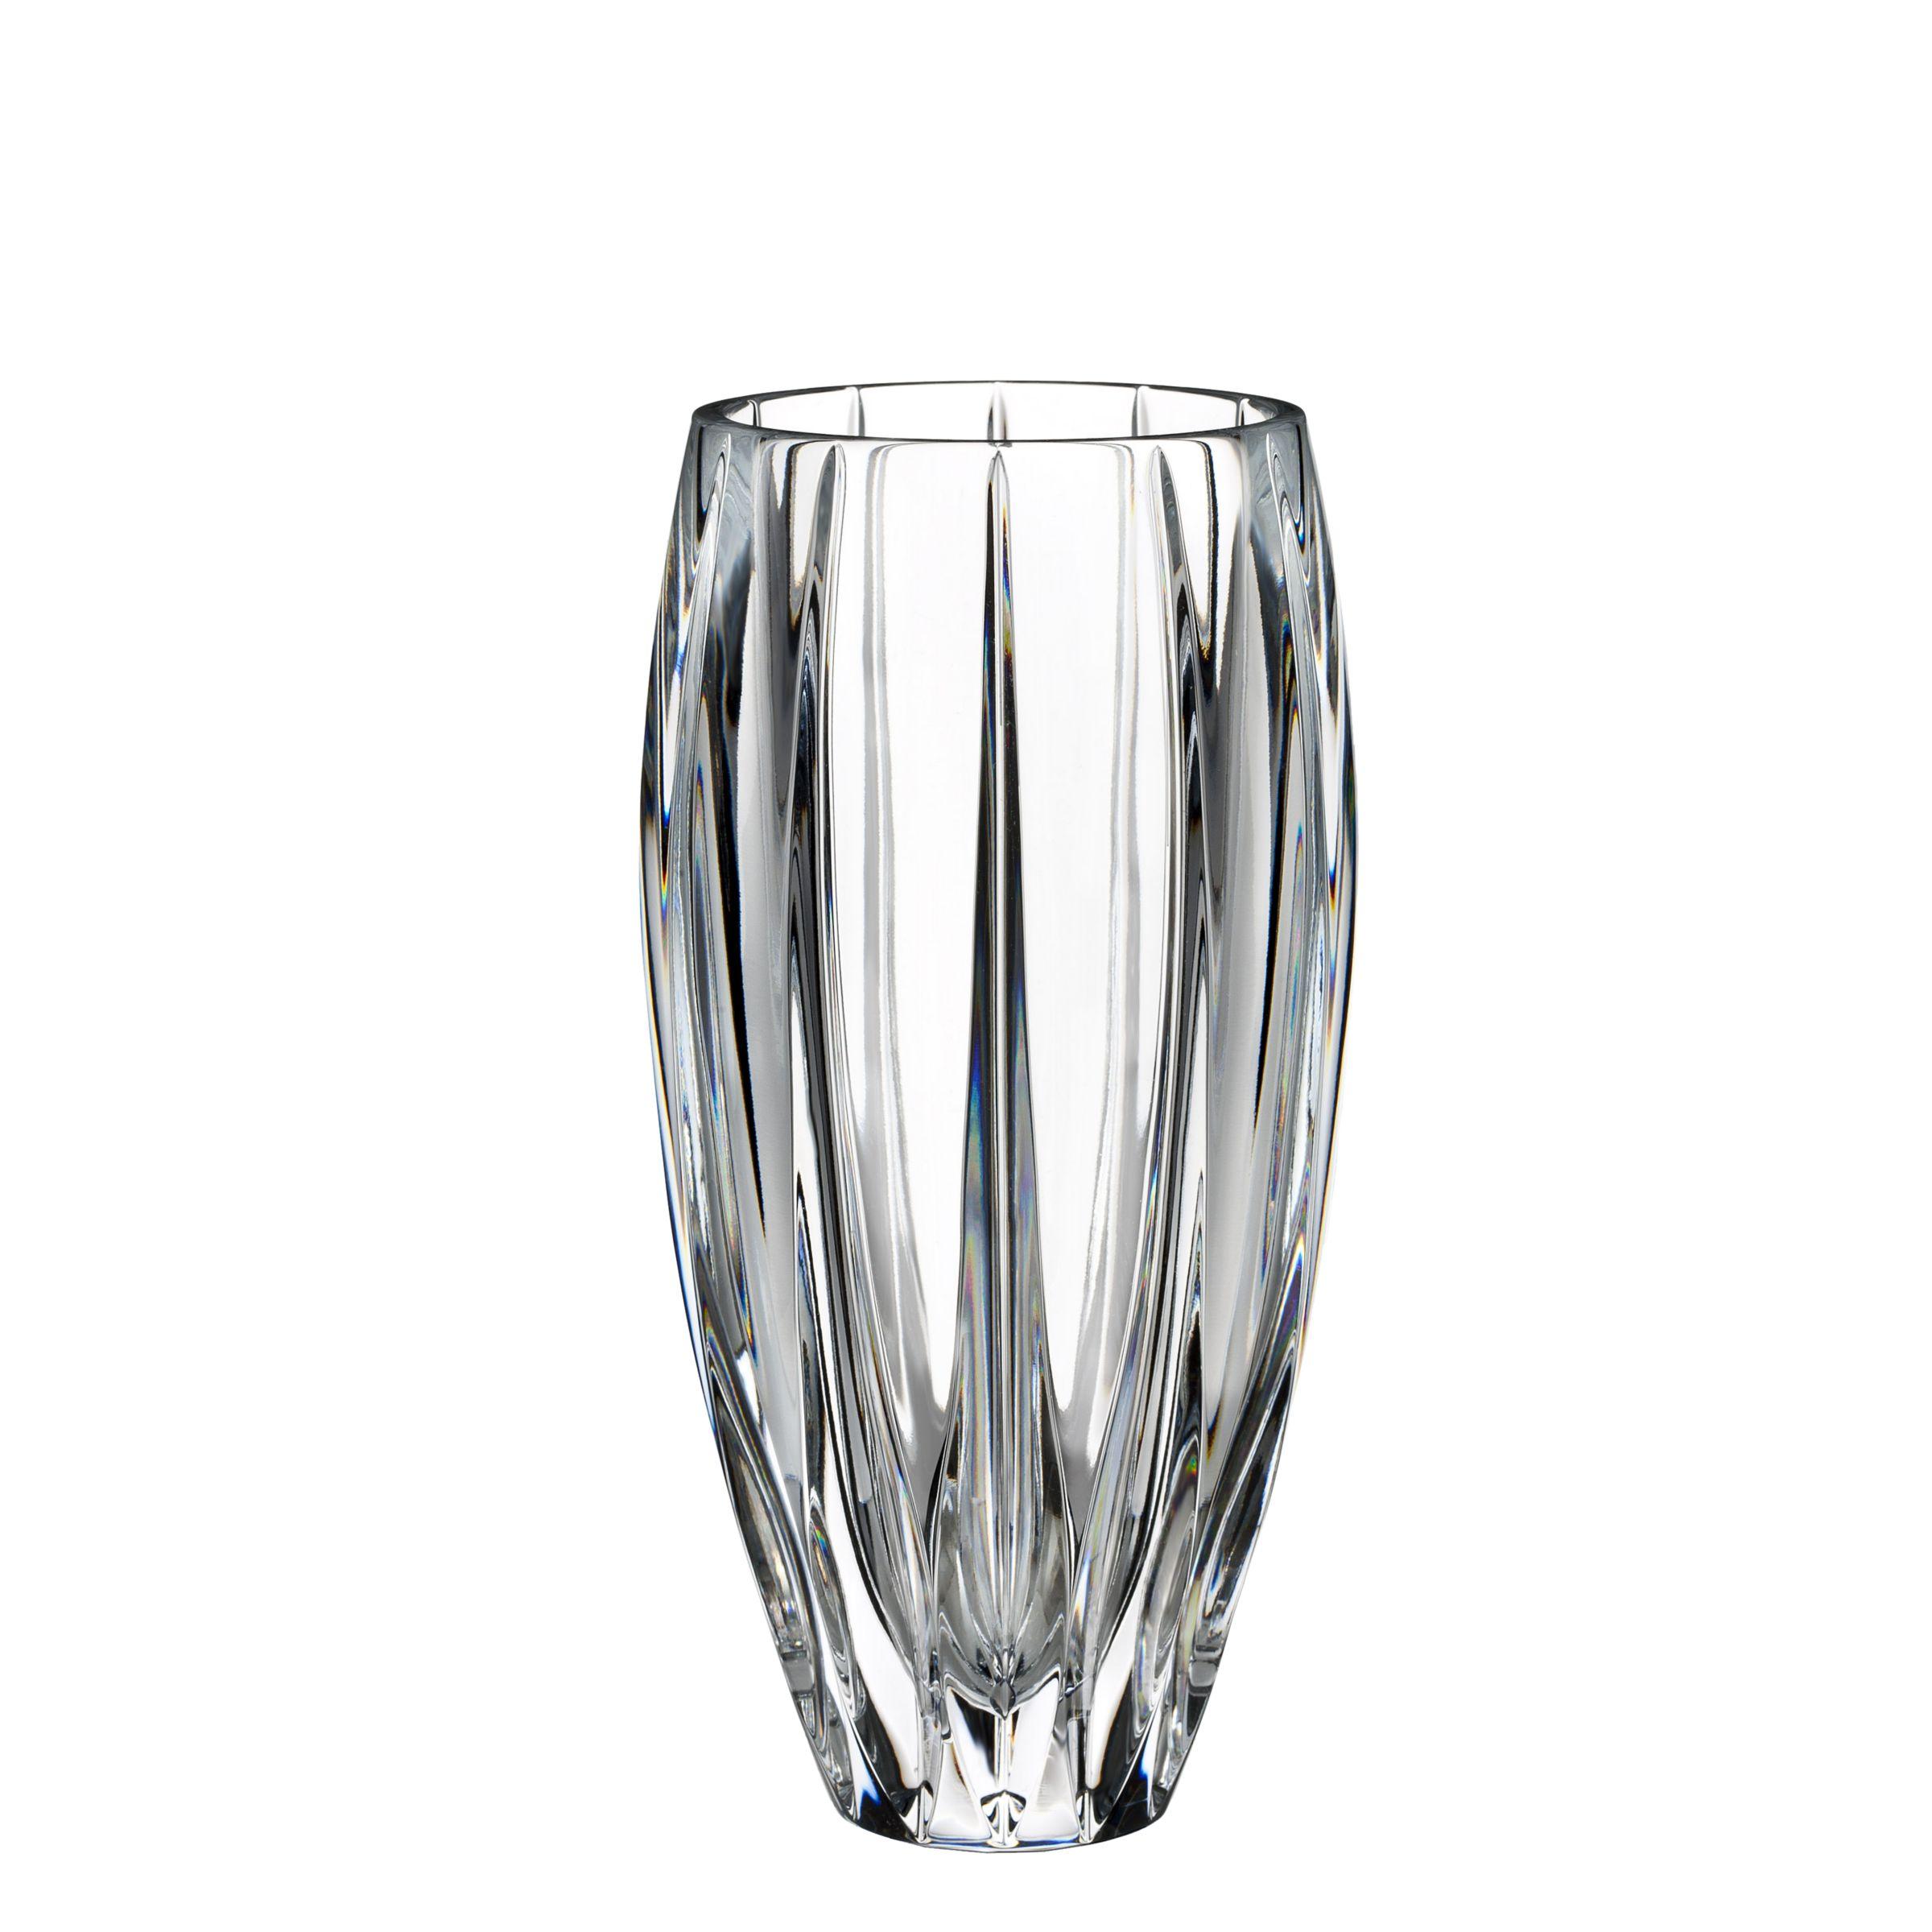 Marquis by Waterford Marquis by Waterford Phoenix Crystal Vase